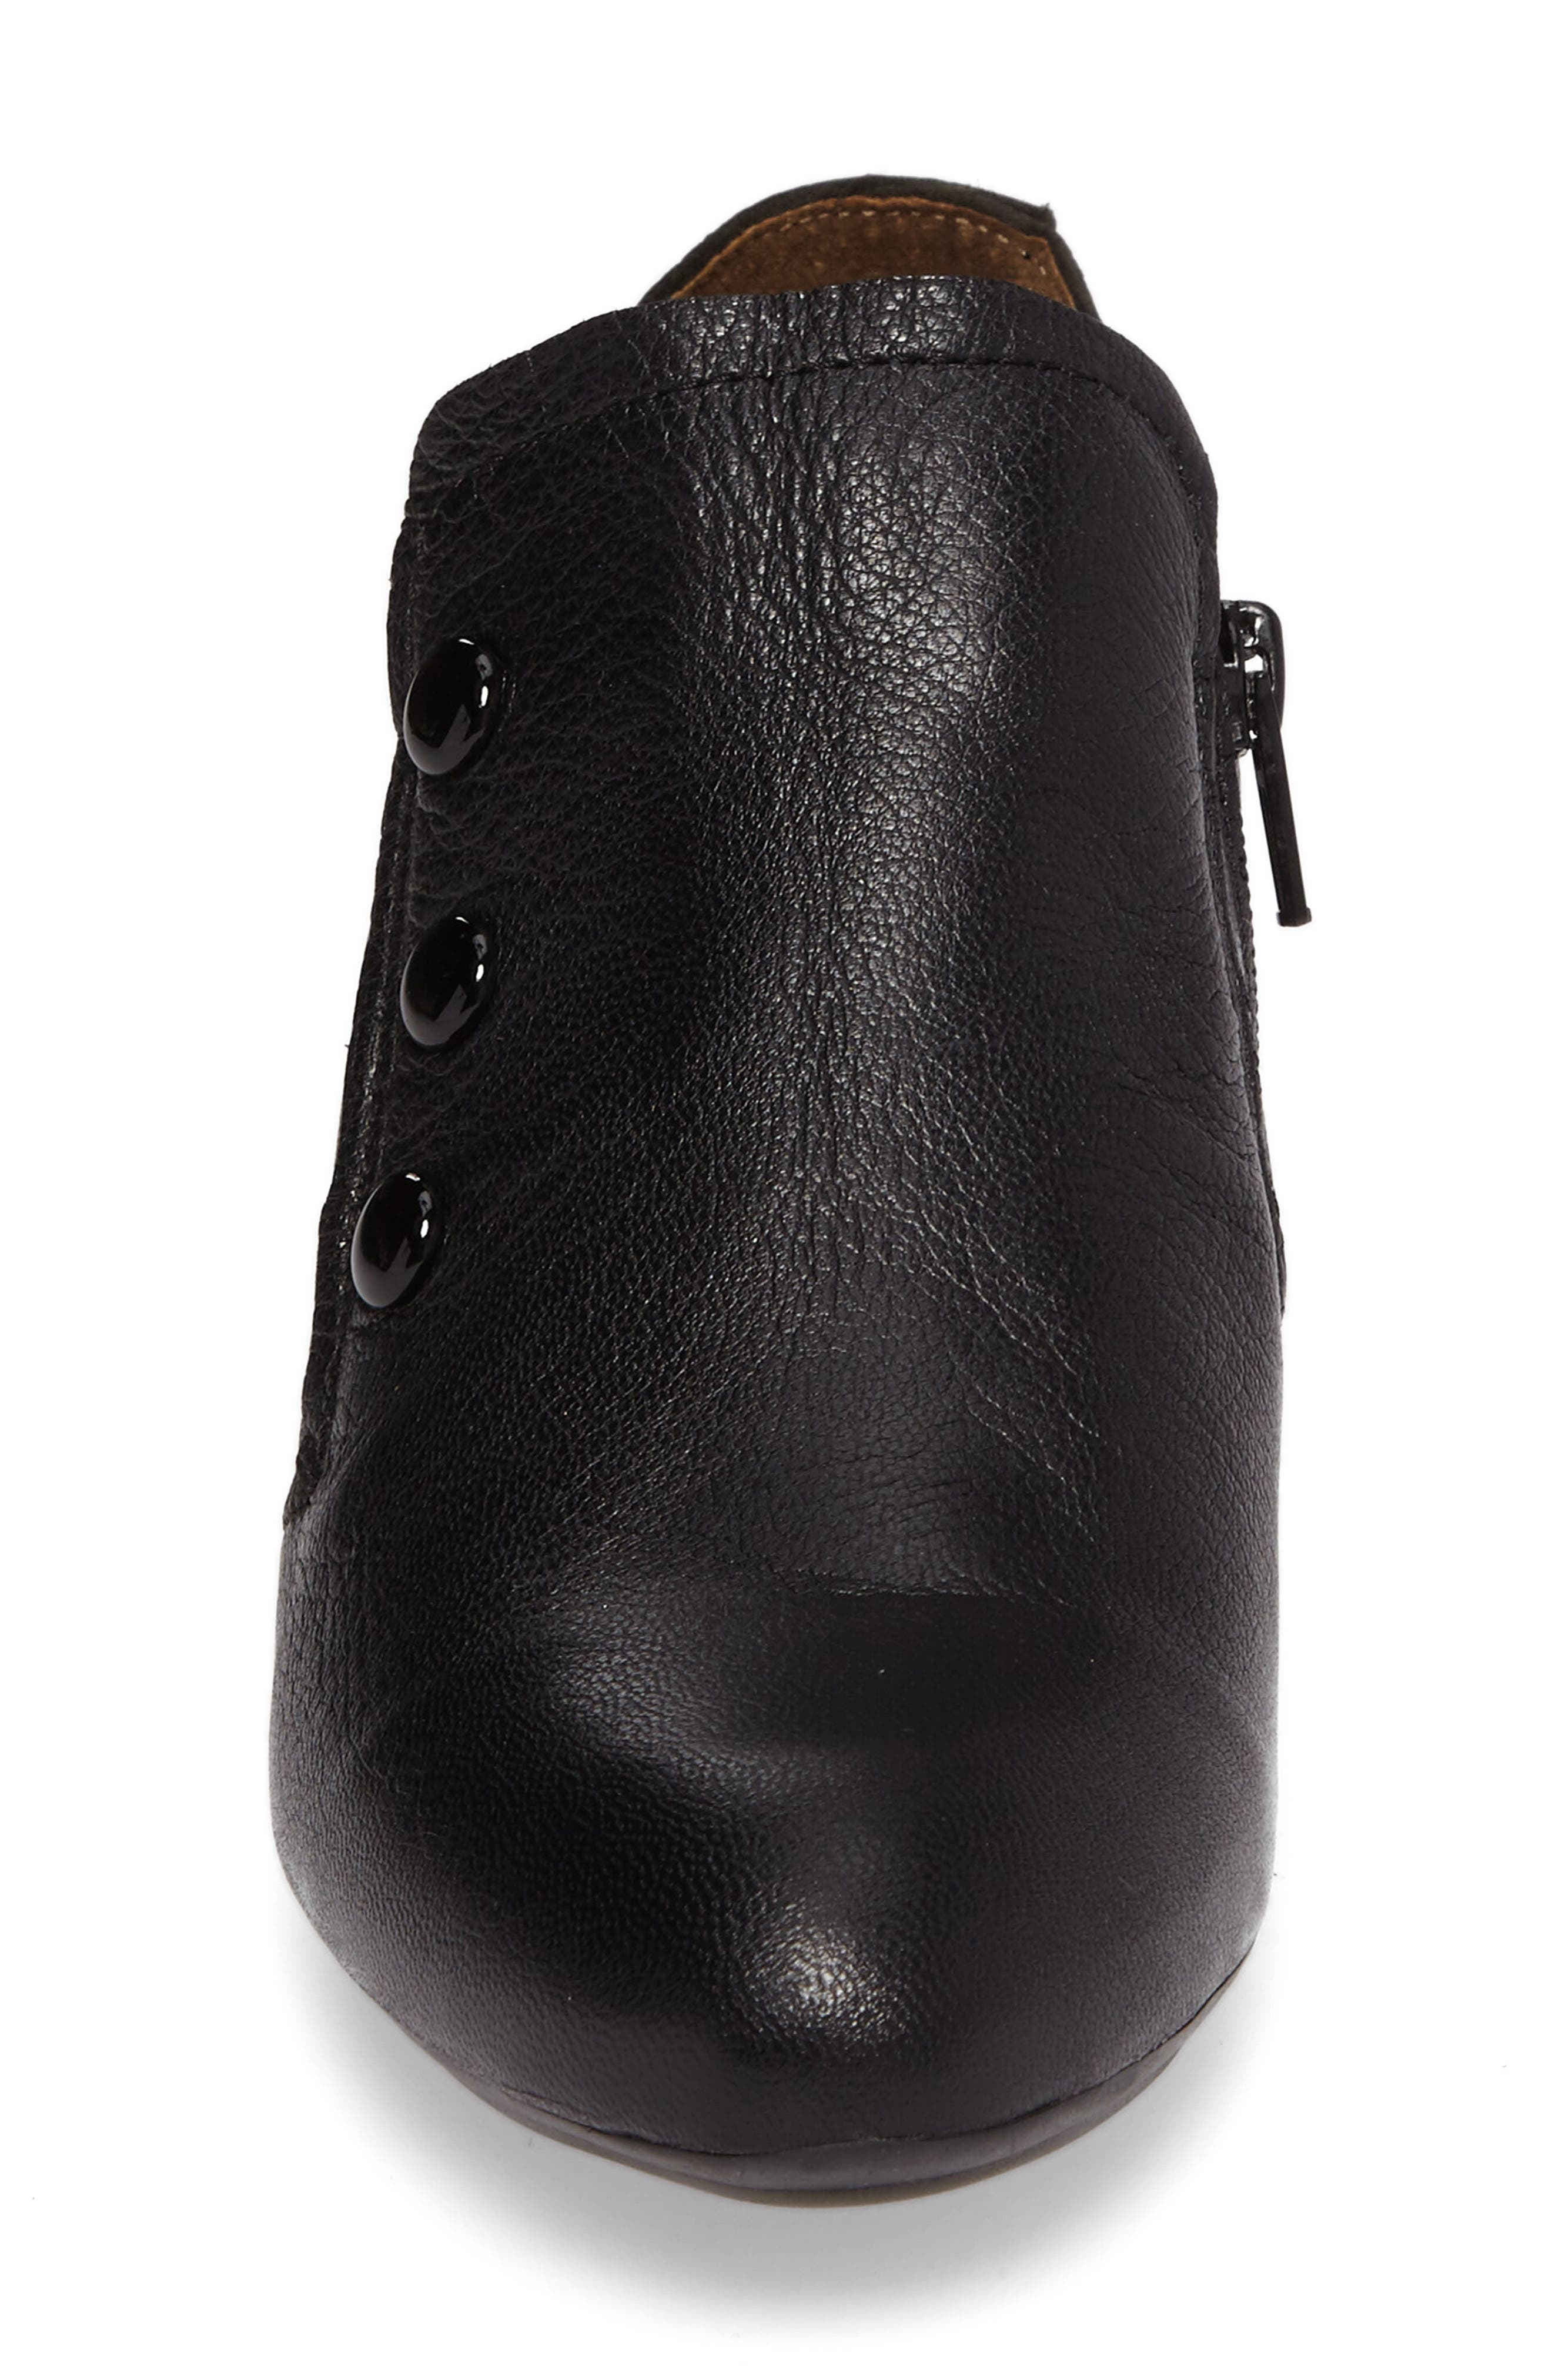 Baff Kitten Heel Pump,                             Alternate thumbnail 4, color,                             Black Leather